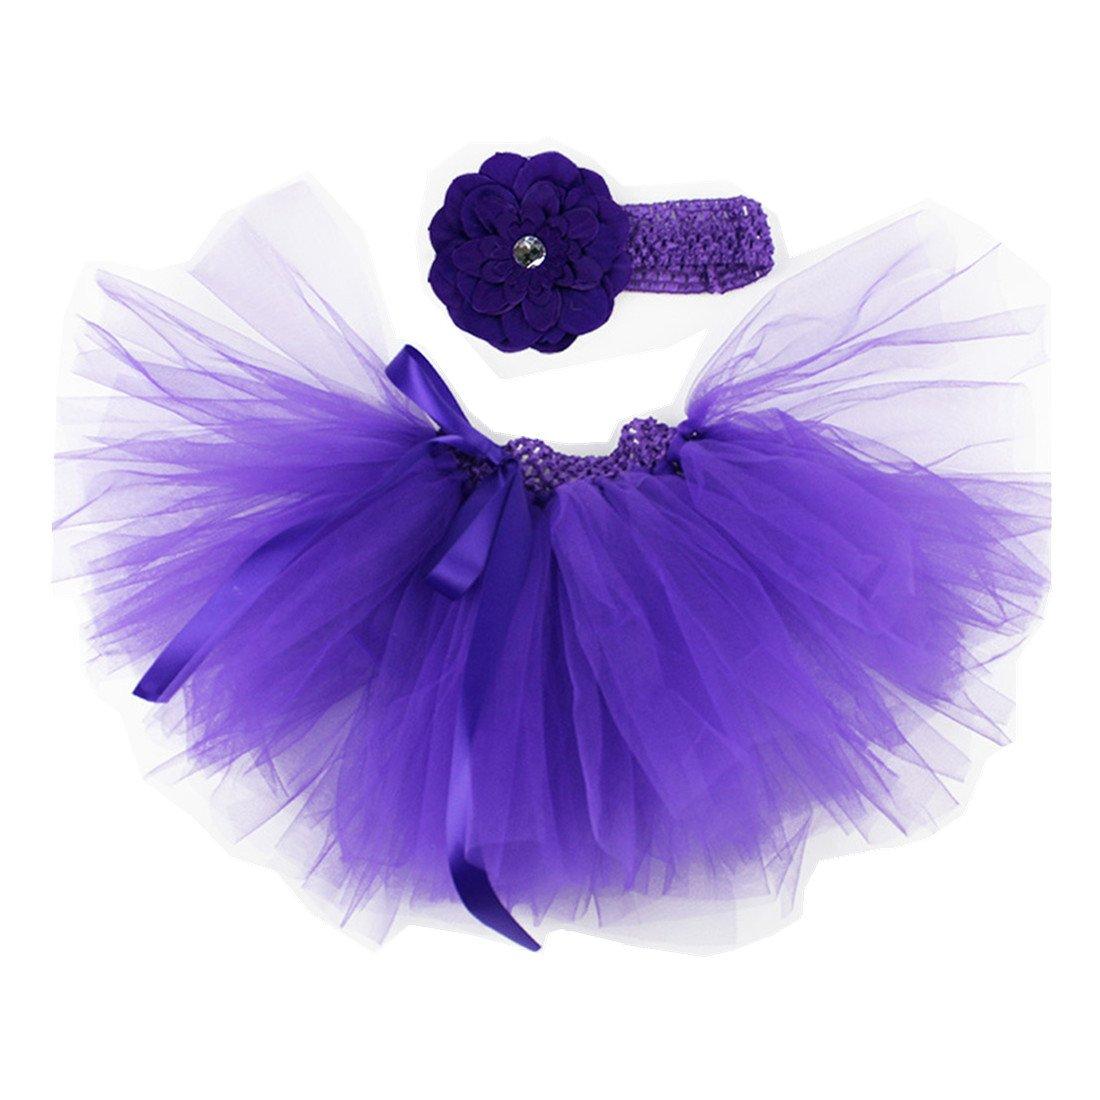 MizHome Newborn Baby Girls Birthday Layered Tulle Tutu Skirt Flower Headwear Outfits MizHome-babytutu-523363940516-18